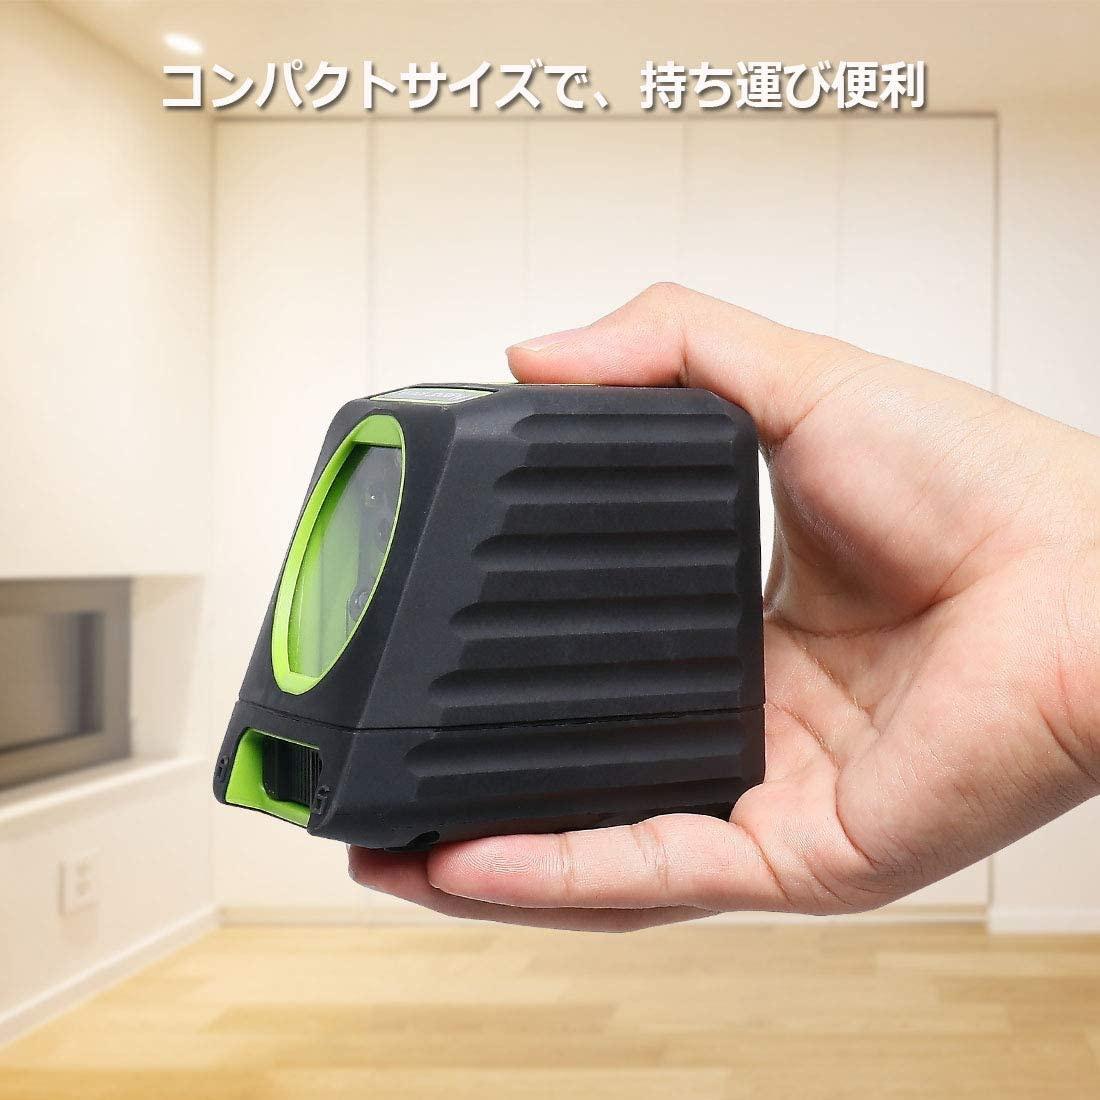 Huepar(ヒューパー) 2ライン レーザー墨出し器 M-BOX-1Rの商品画像6